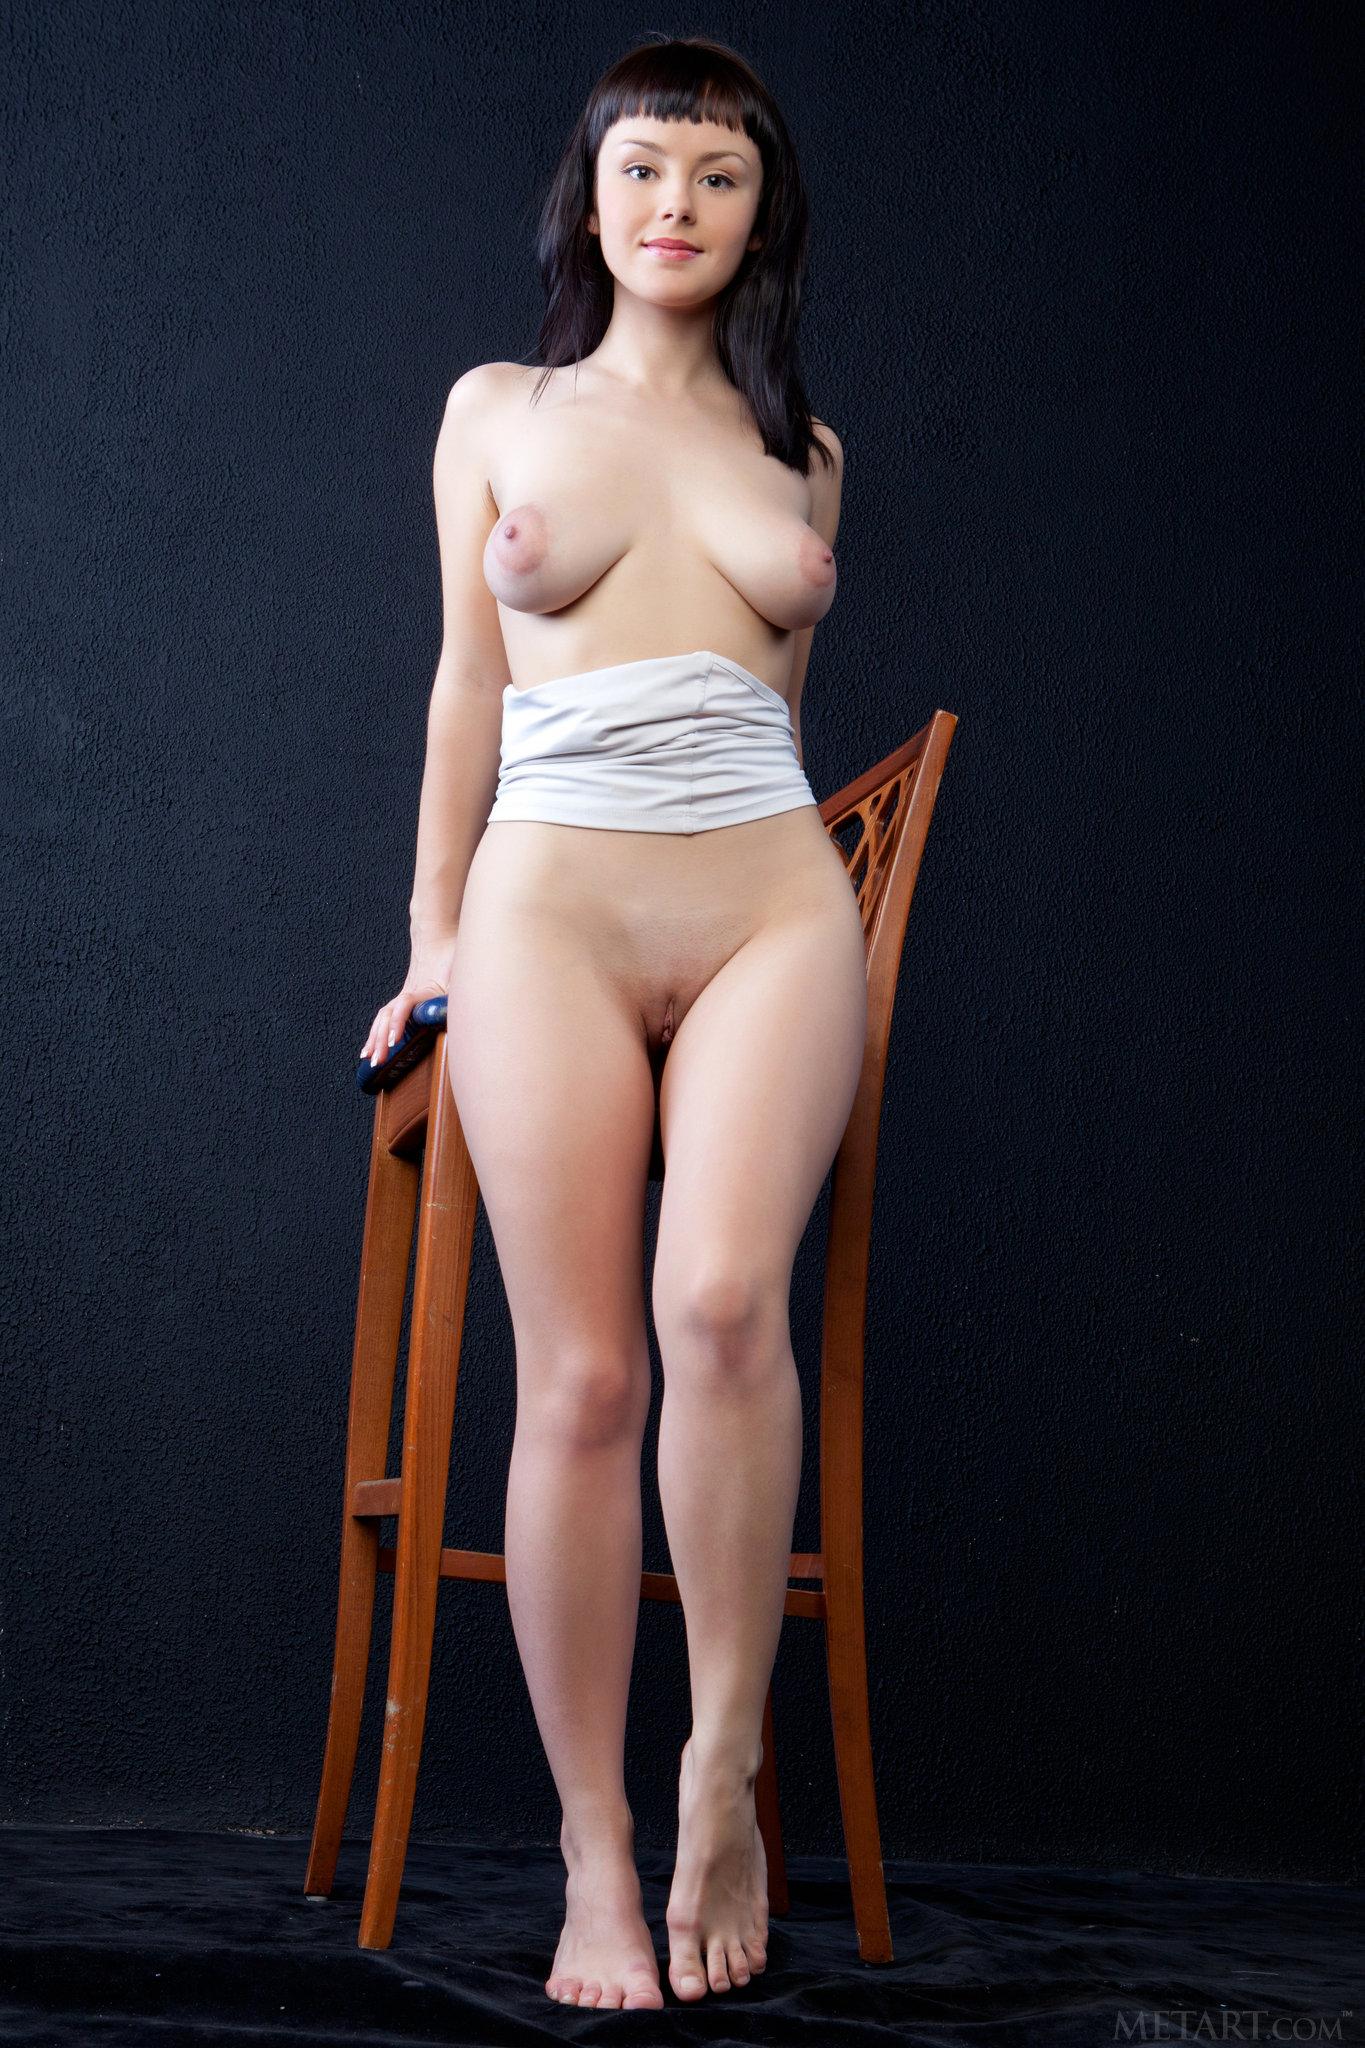 La puta mas grande de peru - 5 8